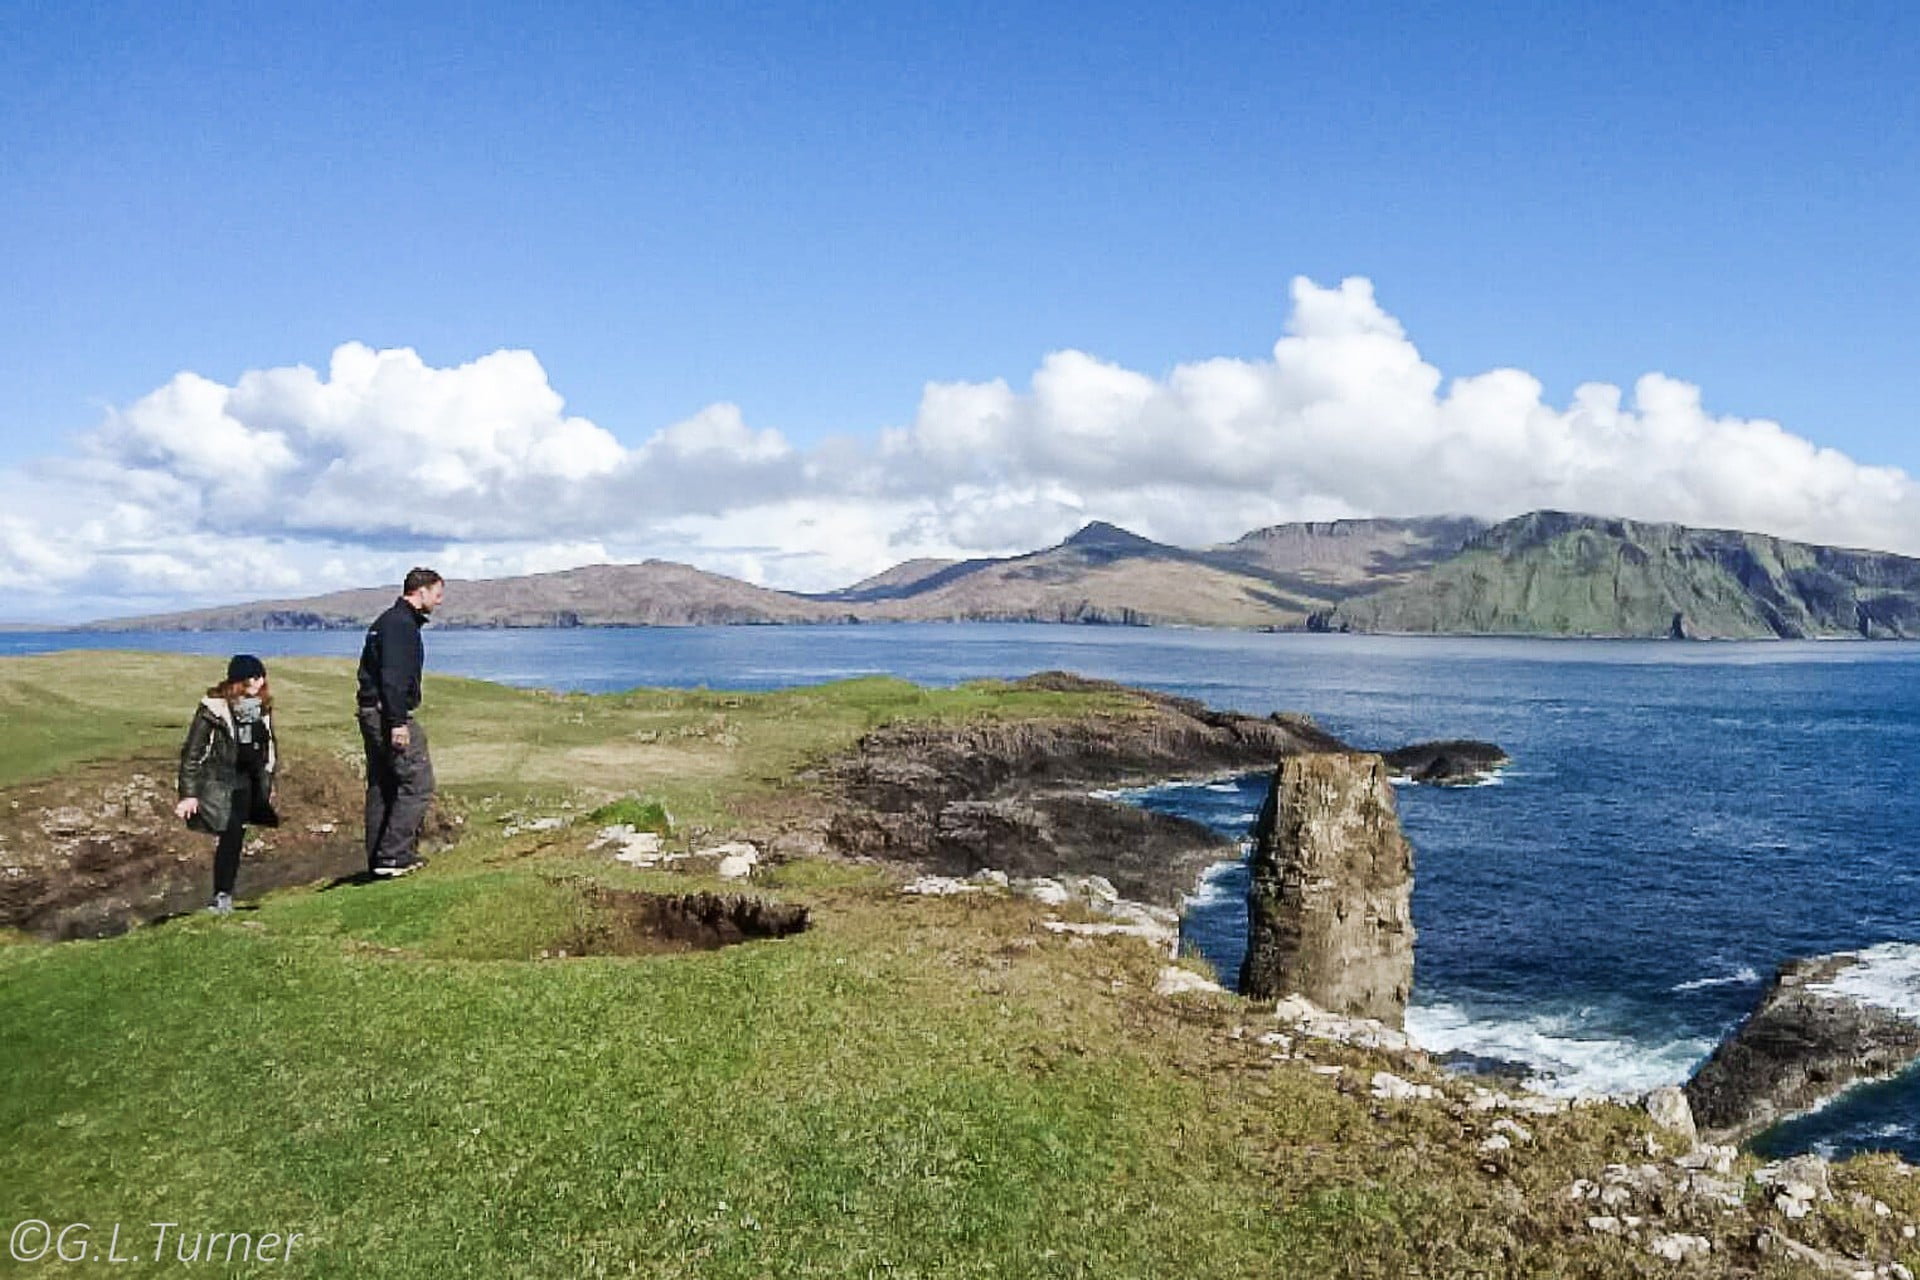 Guests exploring the Hebrides